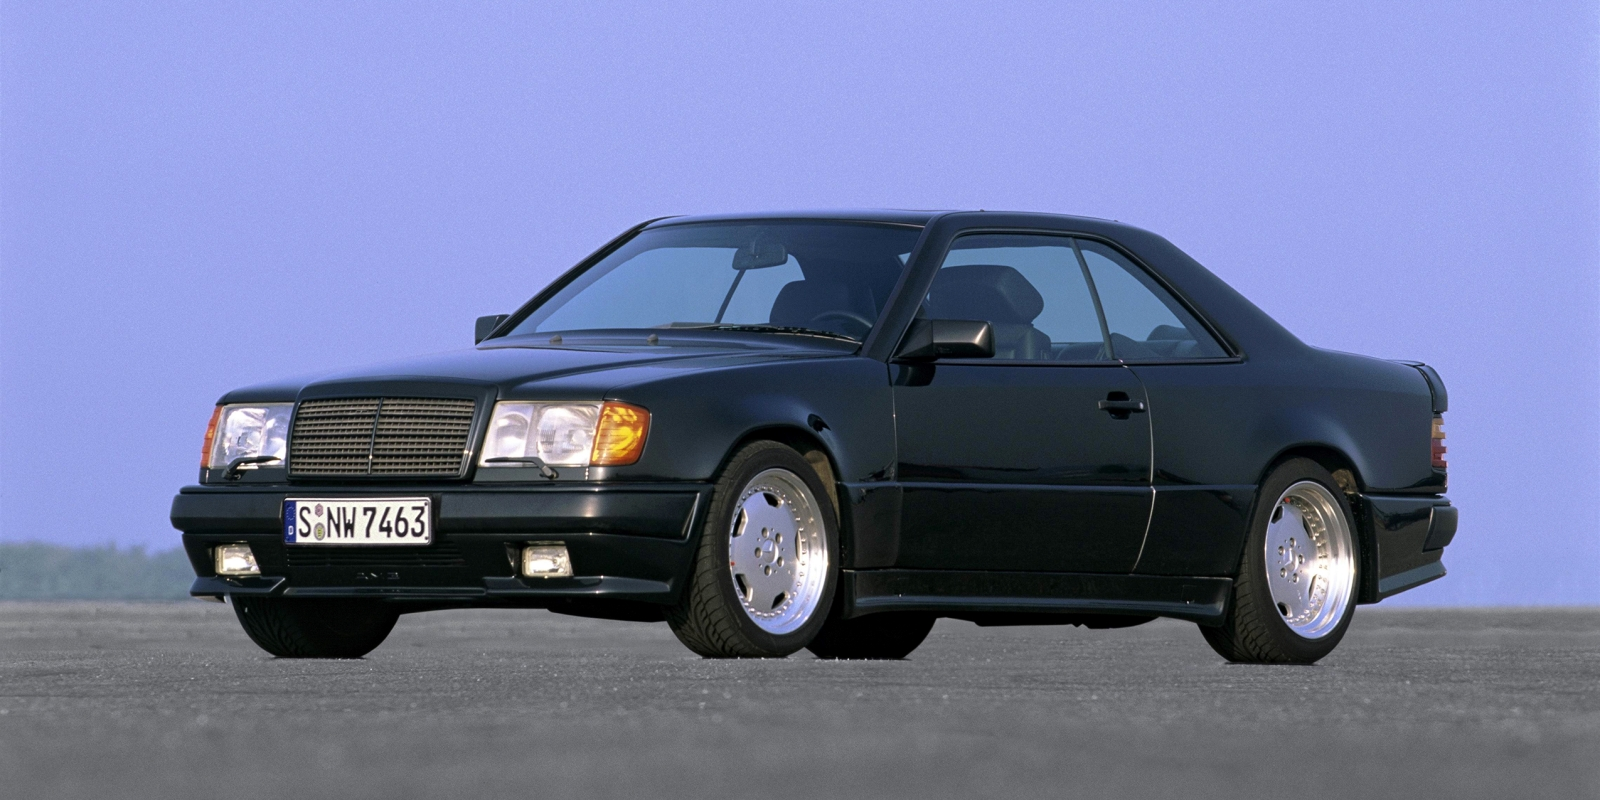 Mercedes-Benz The Hammer Widebody